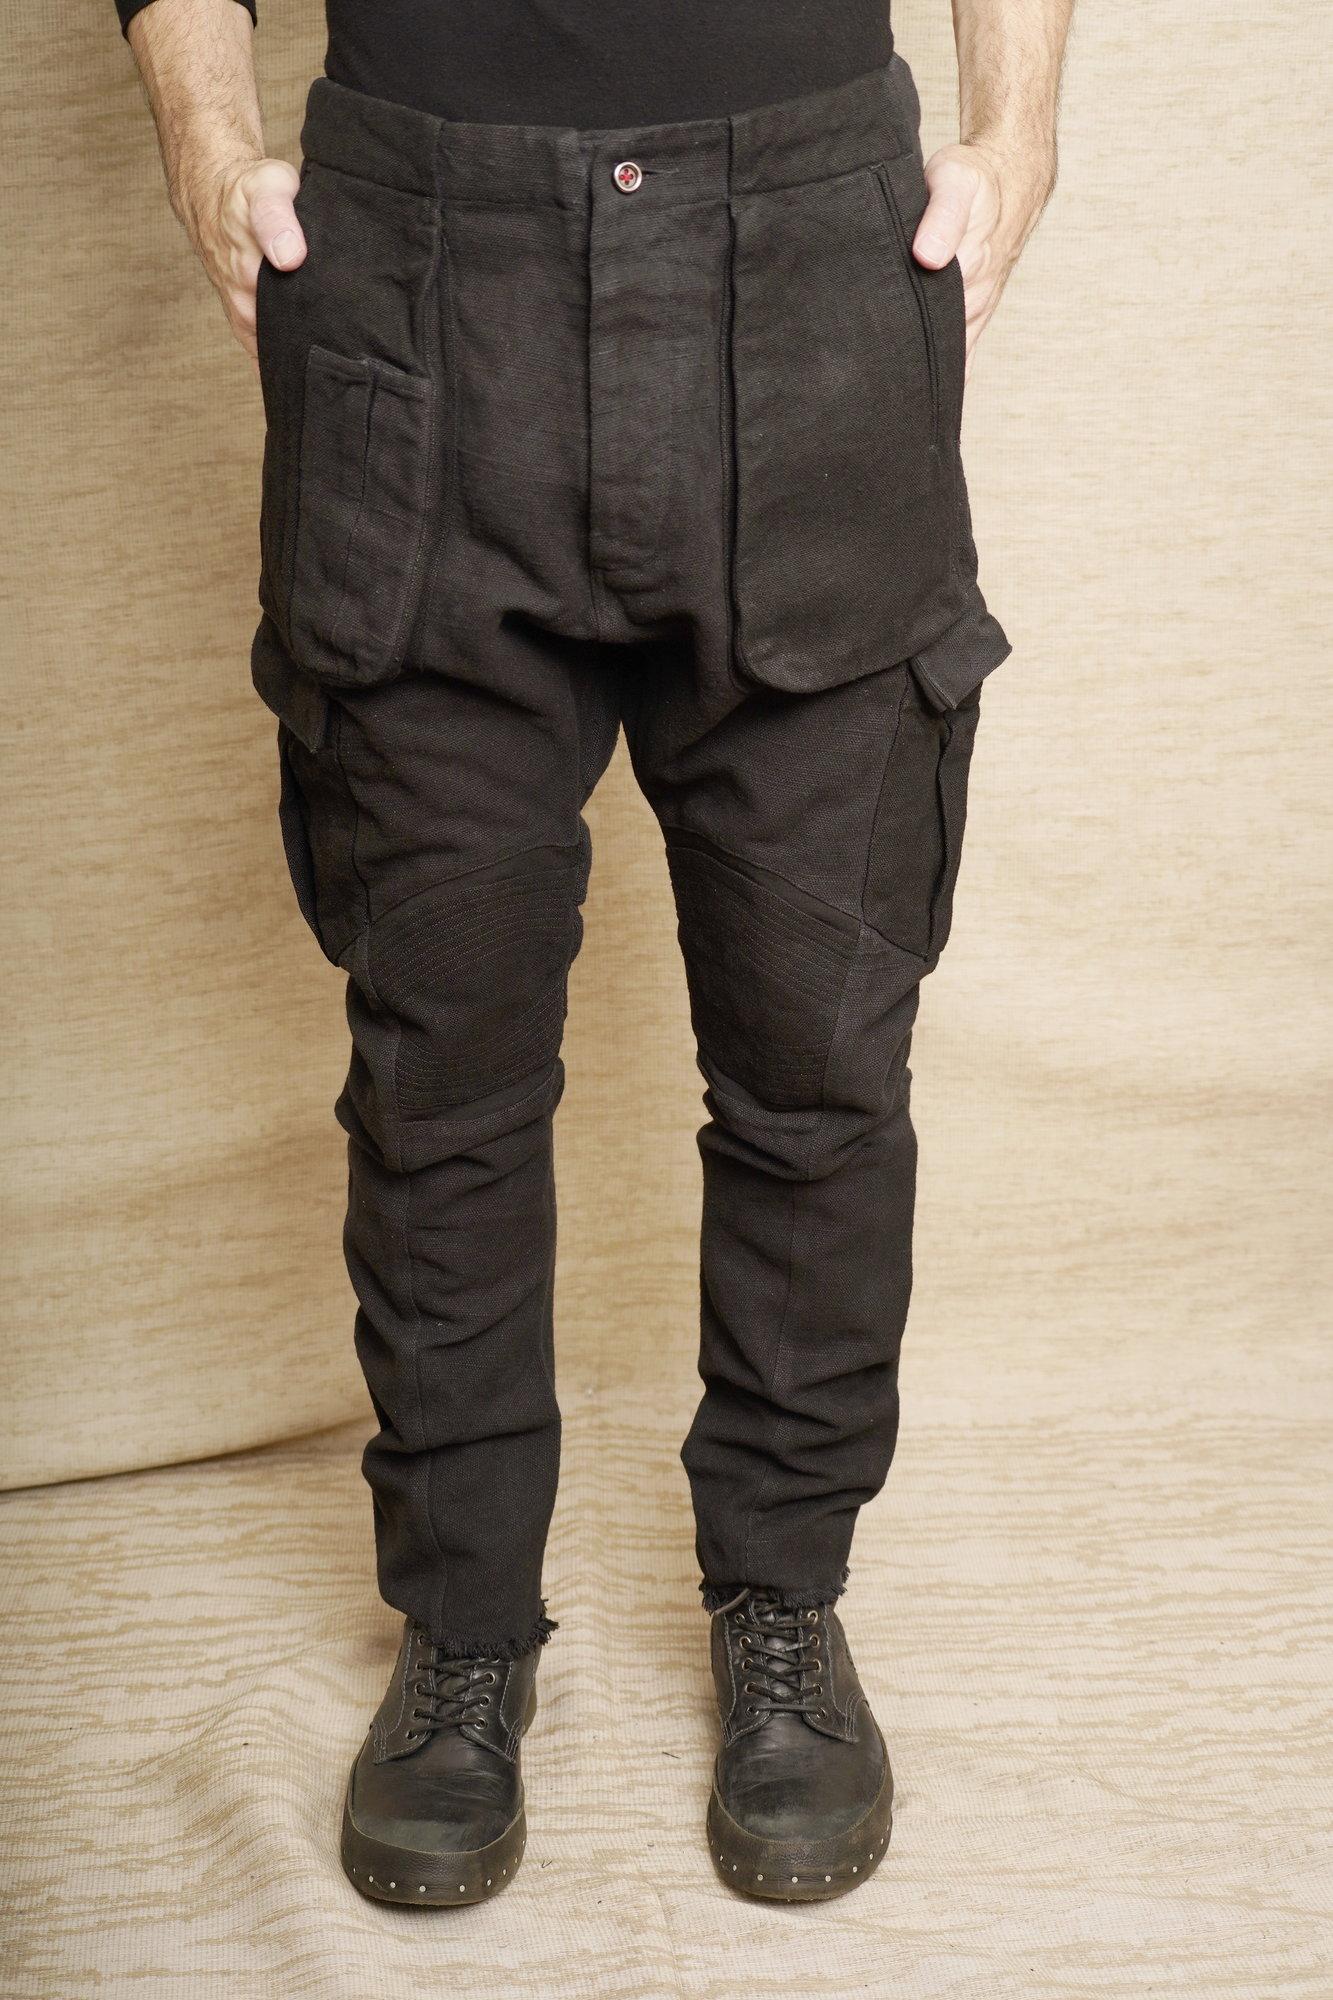 Militia combat pants_2.JPG